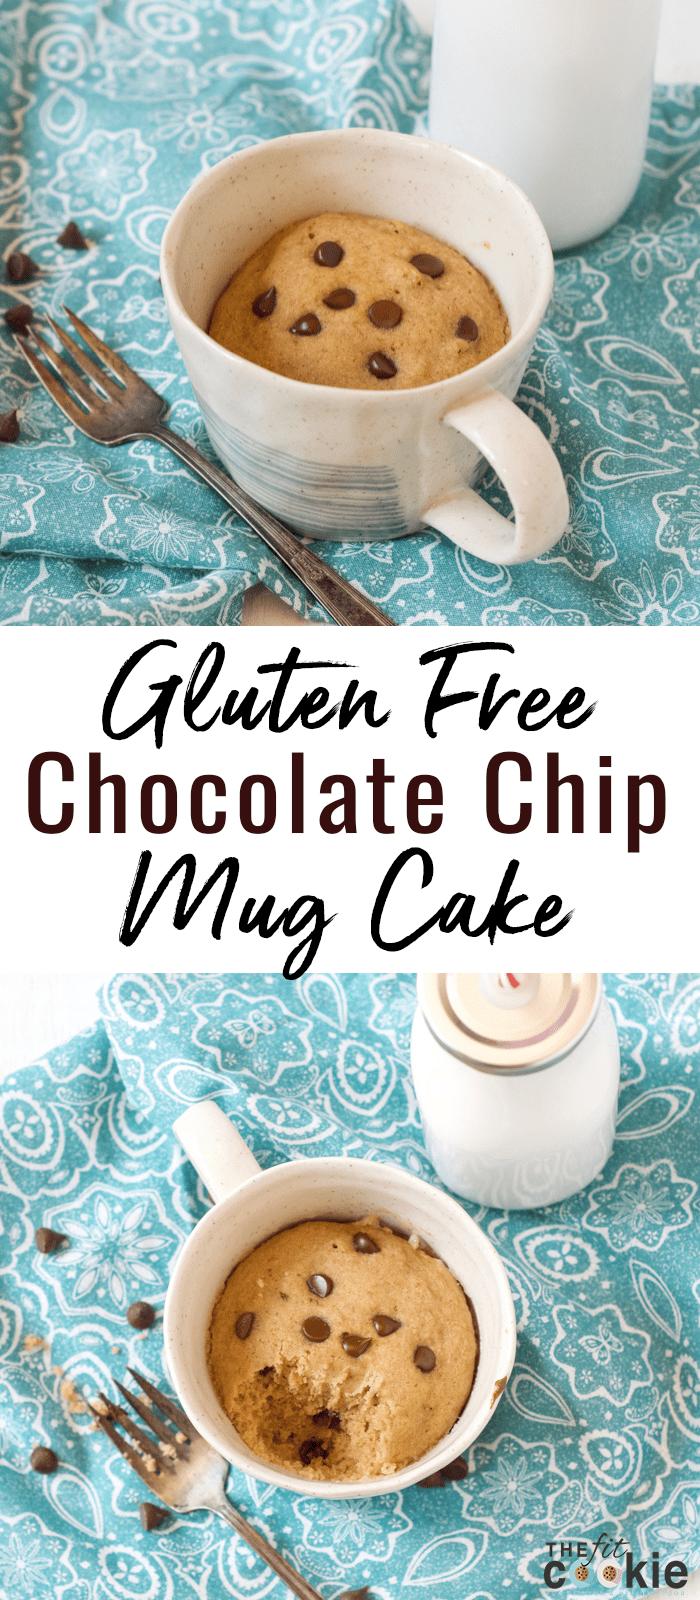 Gluten Free Chocolate Chip Mug Cake Vegan The Fit Cookie